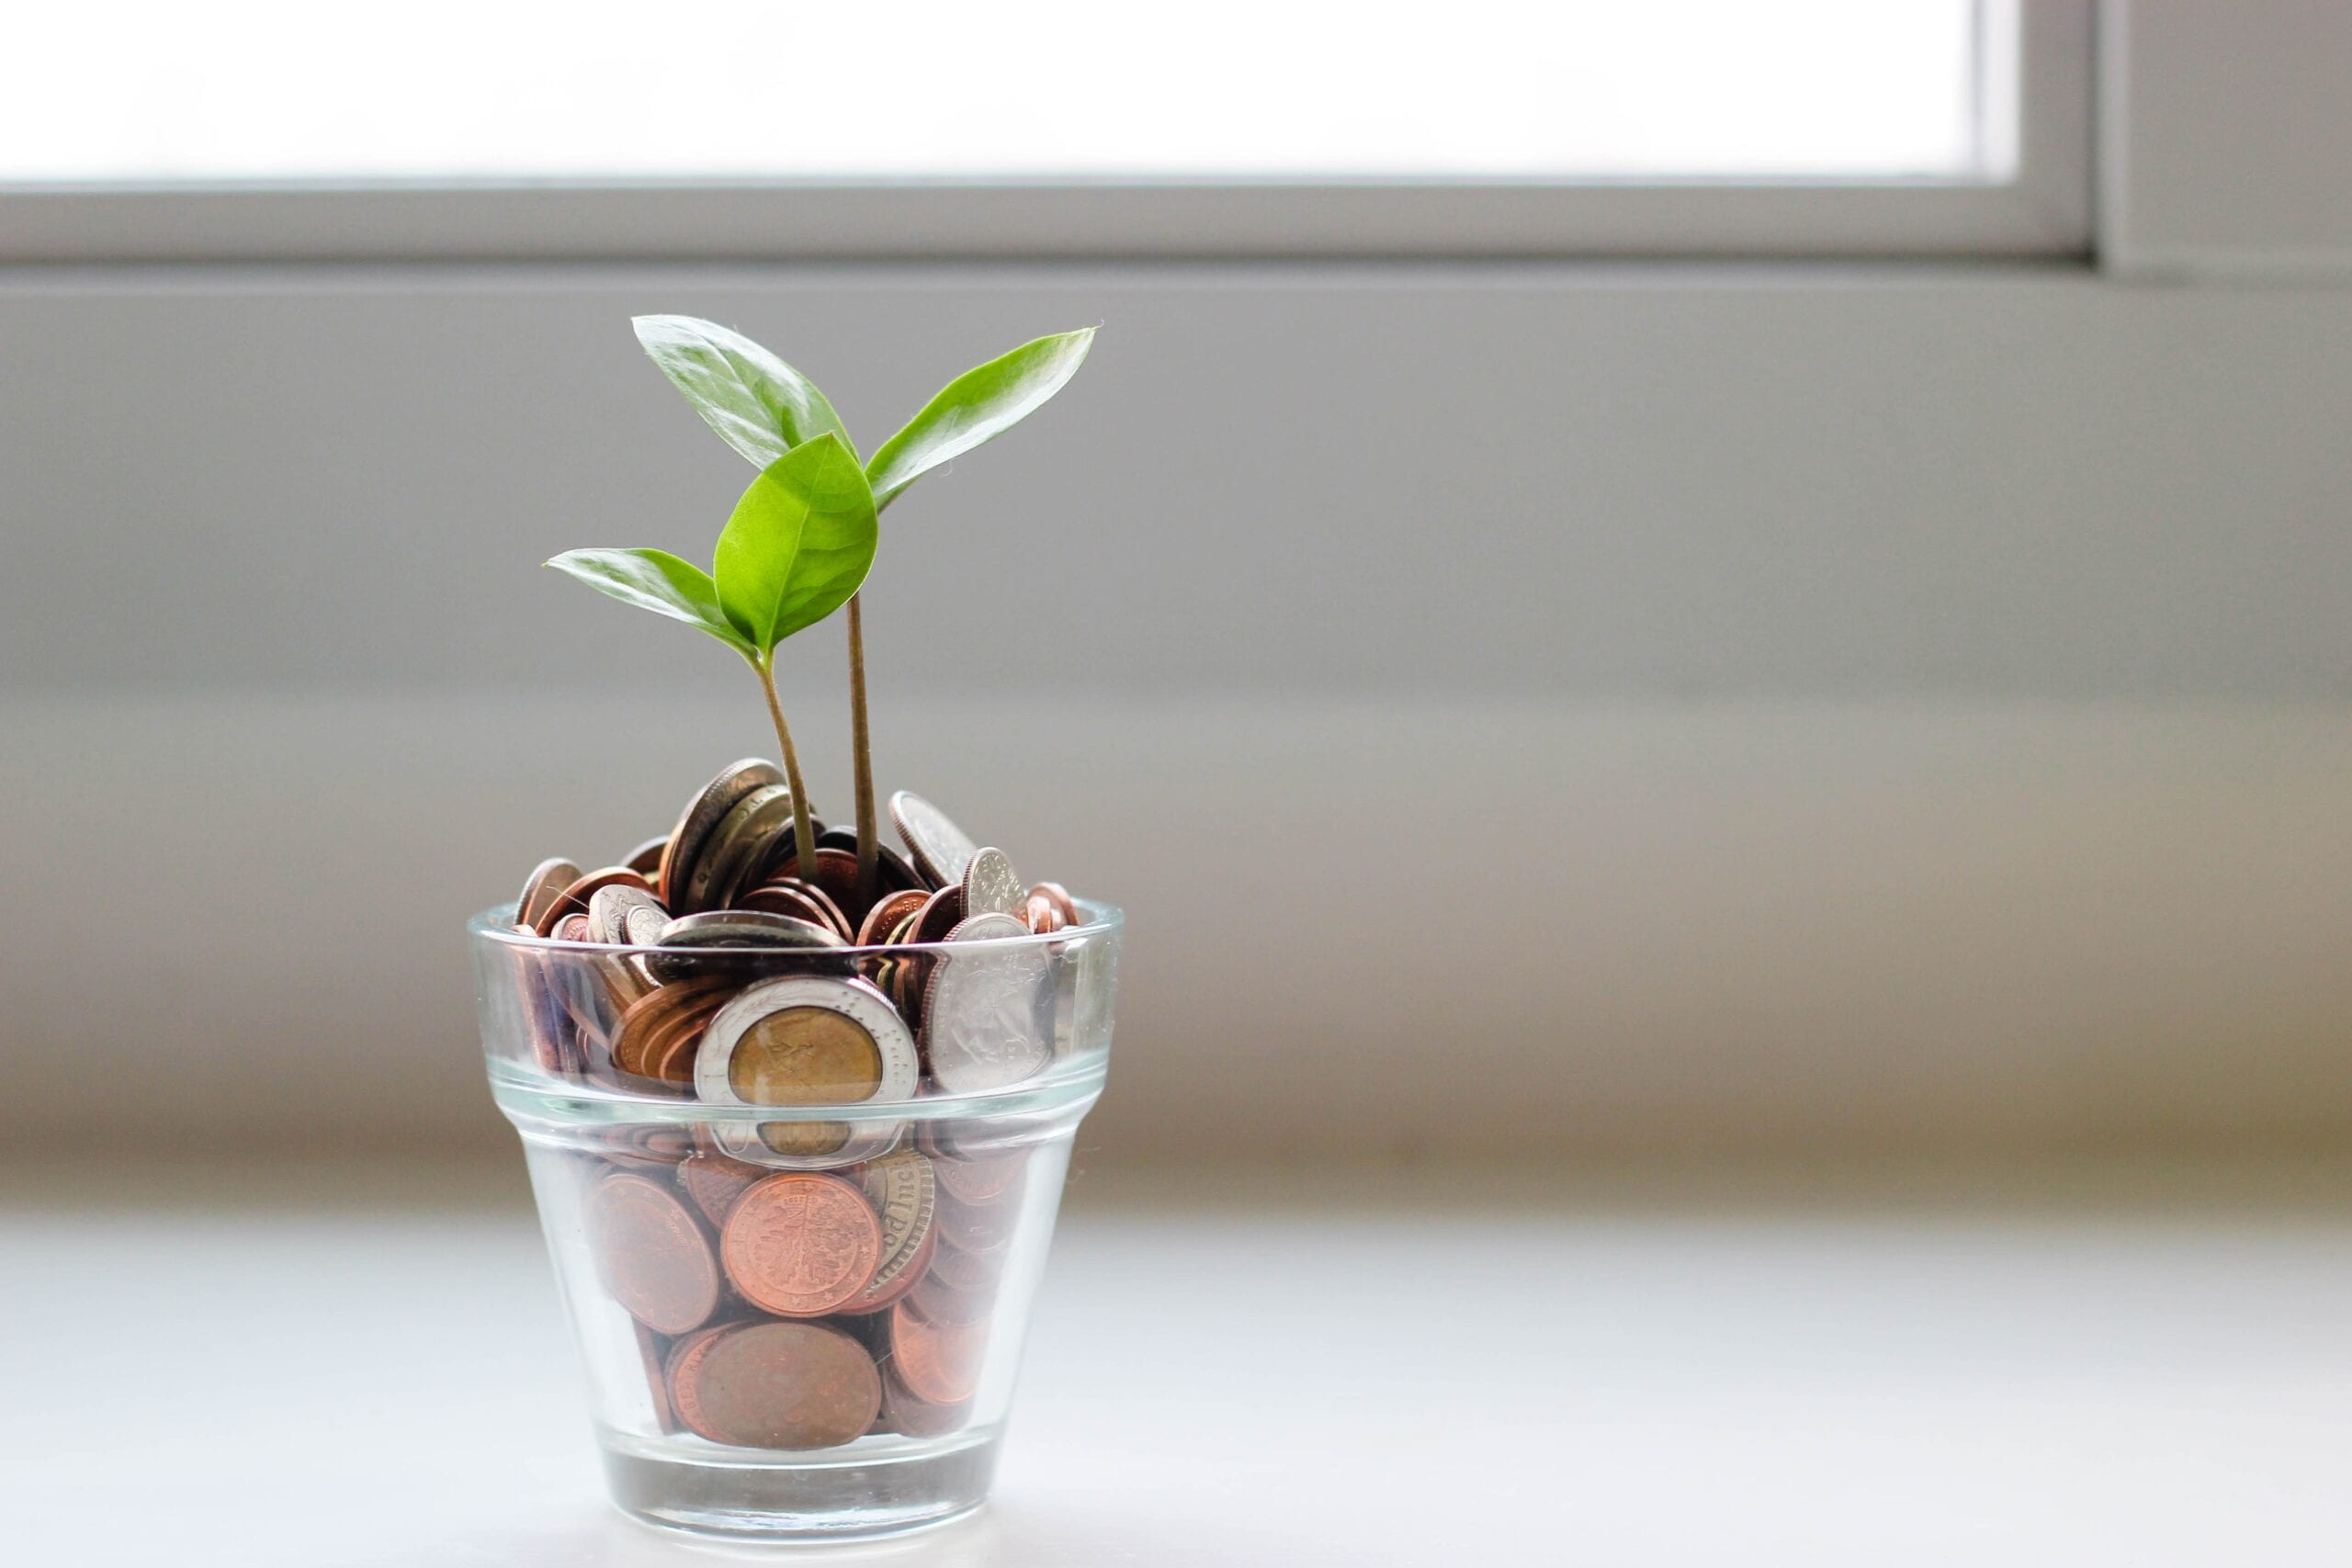 how to build savings